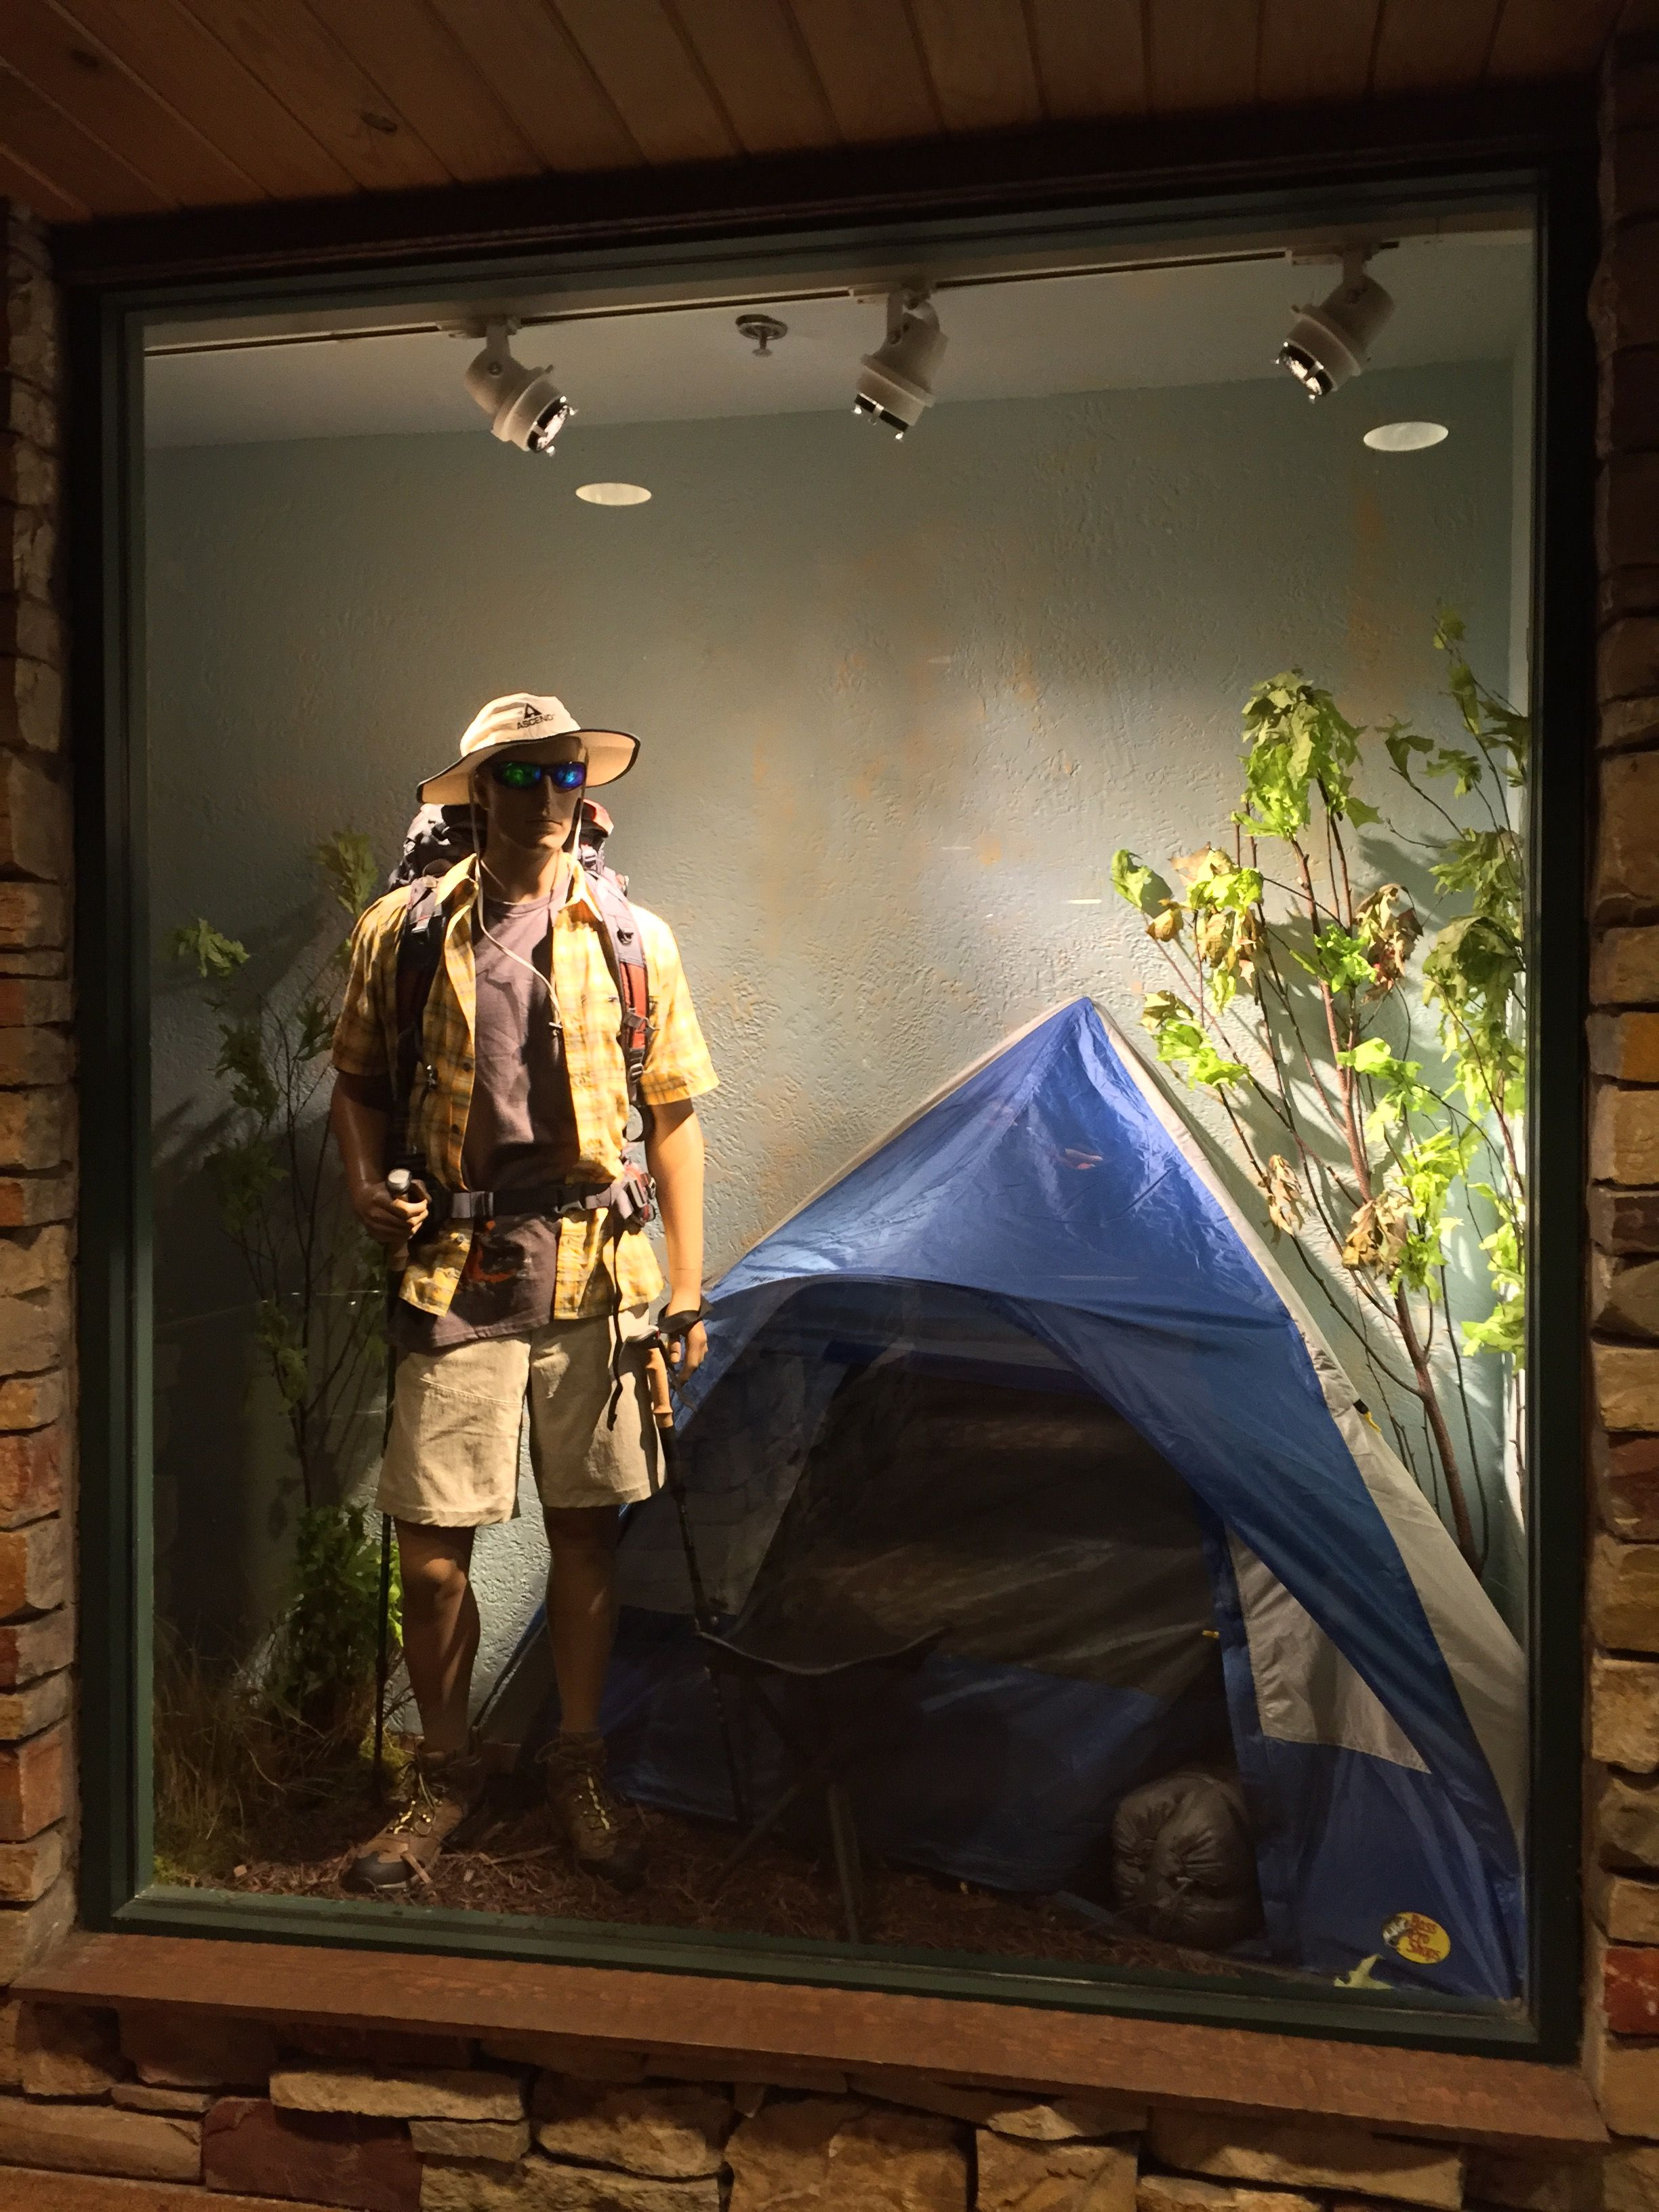 Corner Exhibition Stands Golf : Sds retail design river rock outfitter gabion